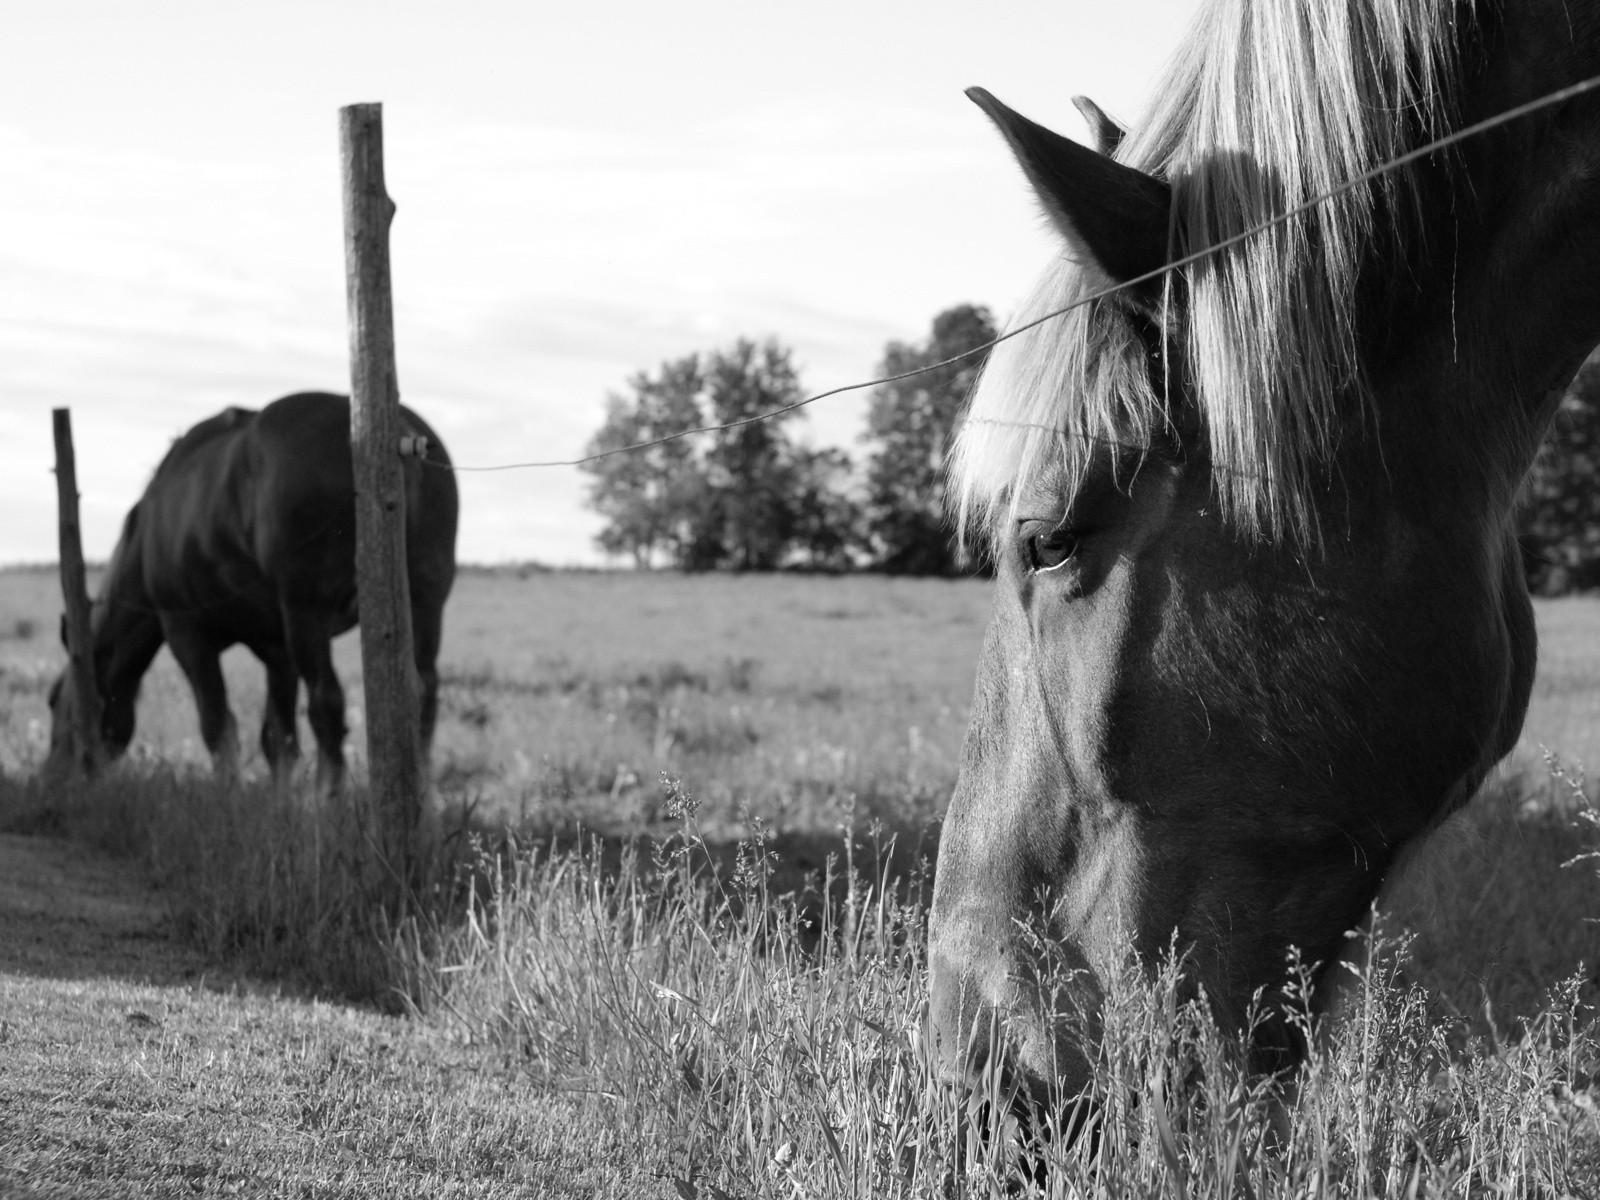 wallpaper animals grass pasture herd mare fauna. Black Bedroom Furniture Sets. Home Design Ideas